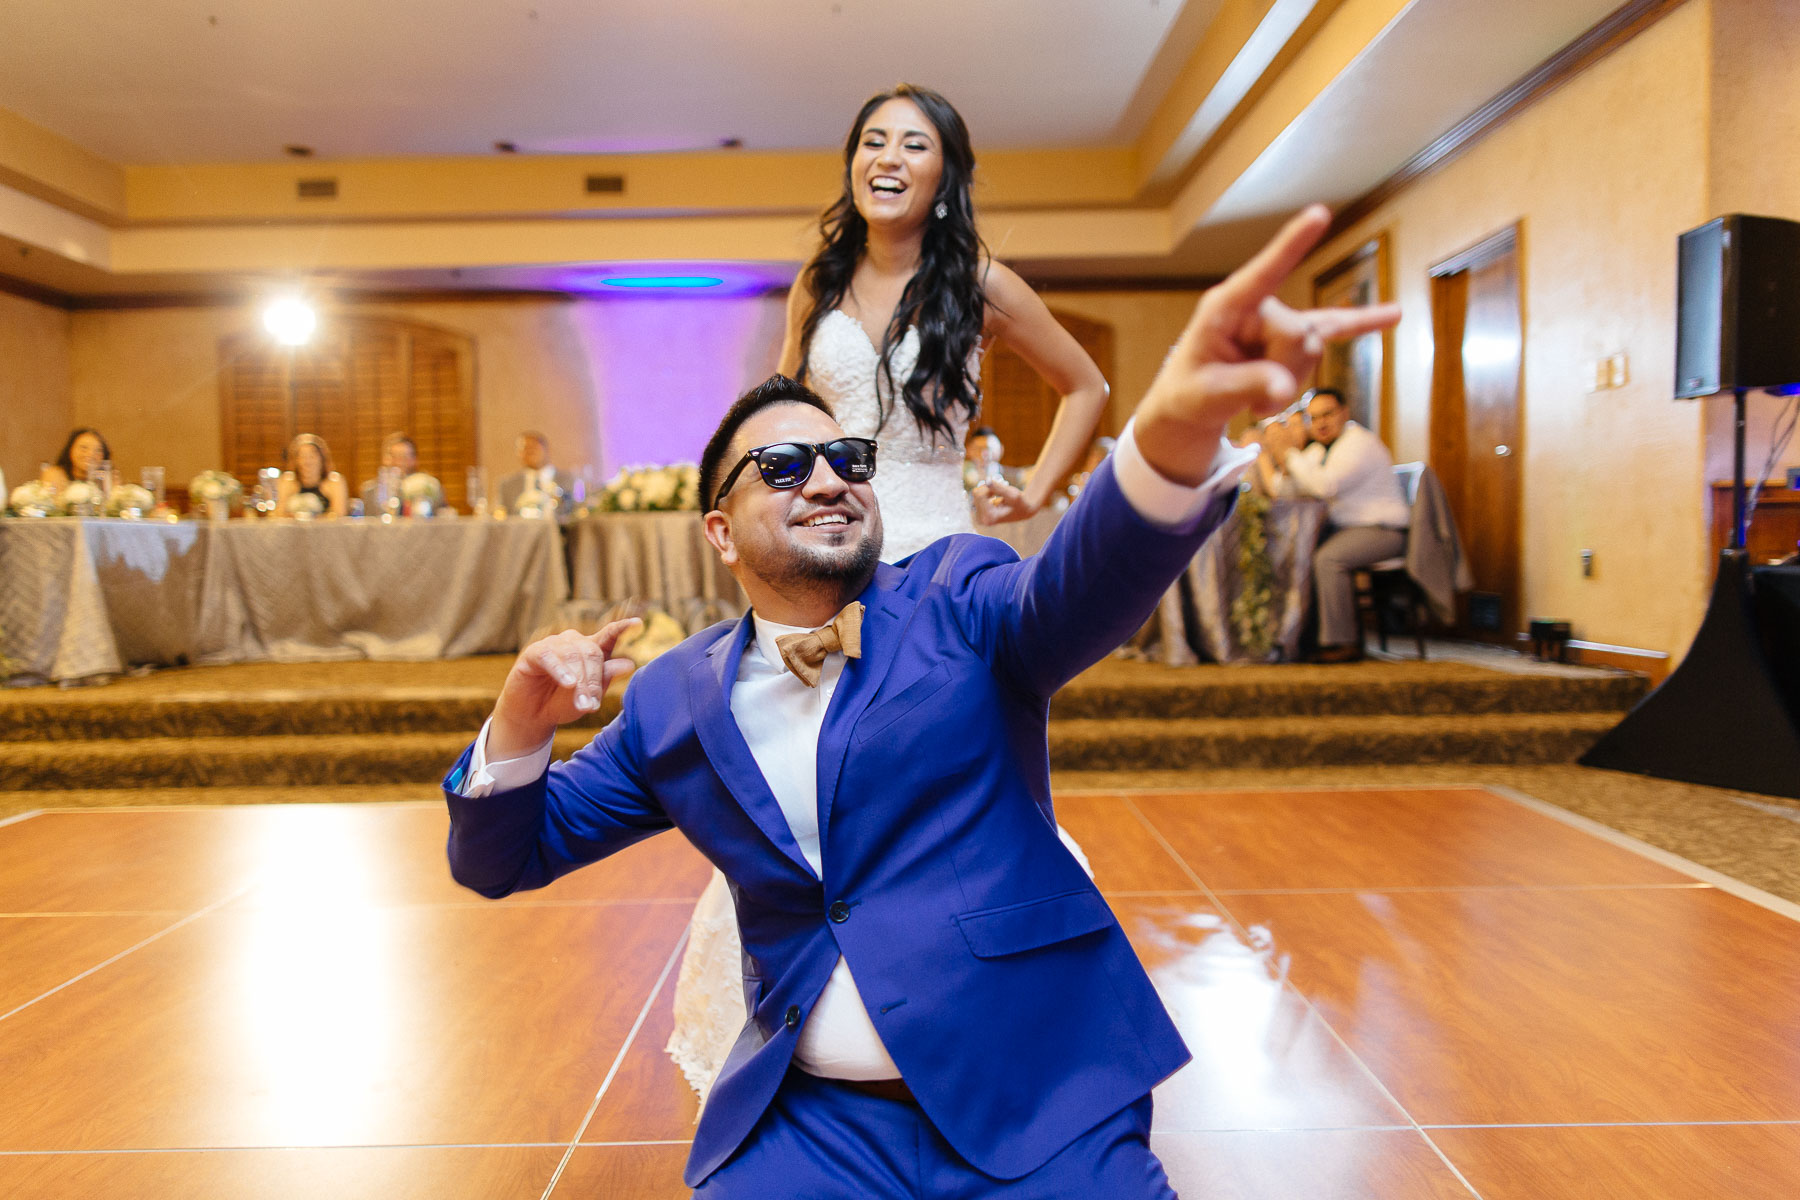 161029-Luxium-Weddings-Arizona-Jeff-Griselda-First-Look-Val-Vista-Lakes-Gilber-081.jpg